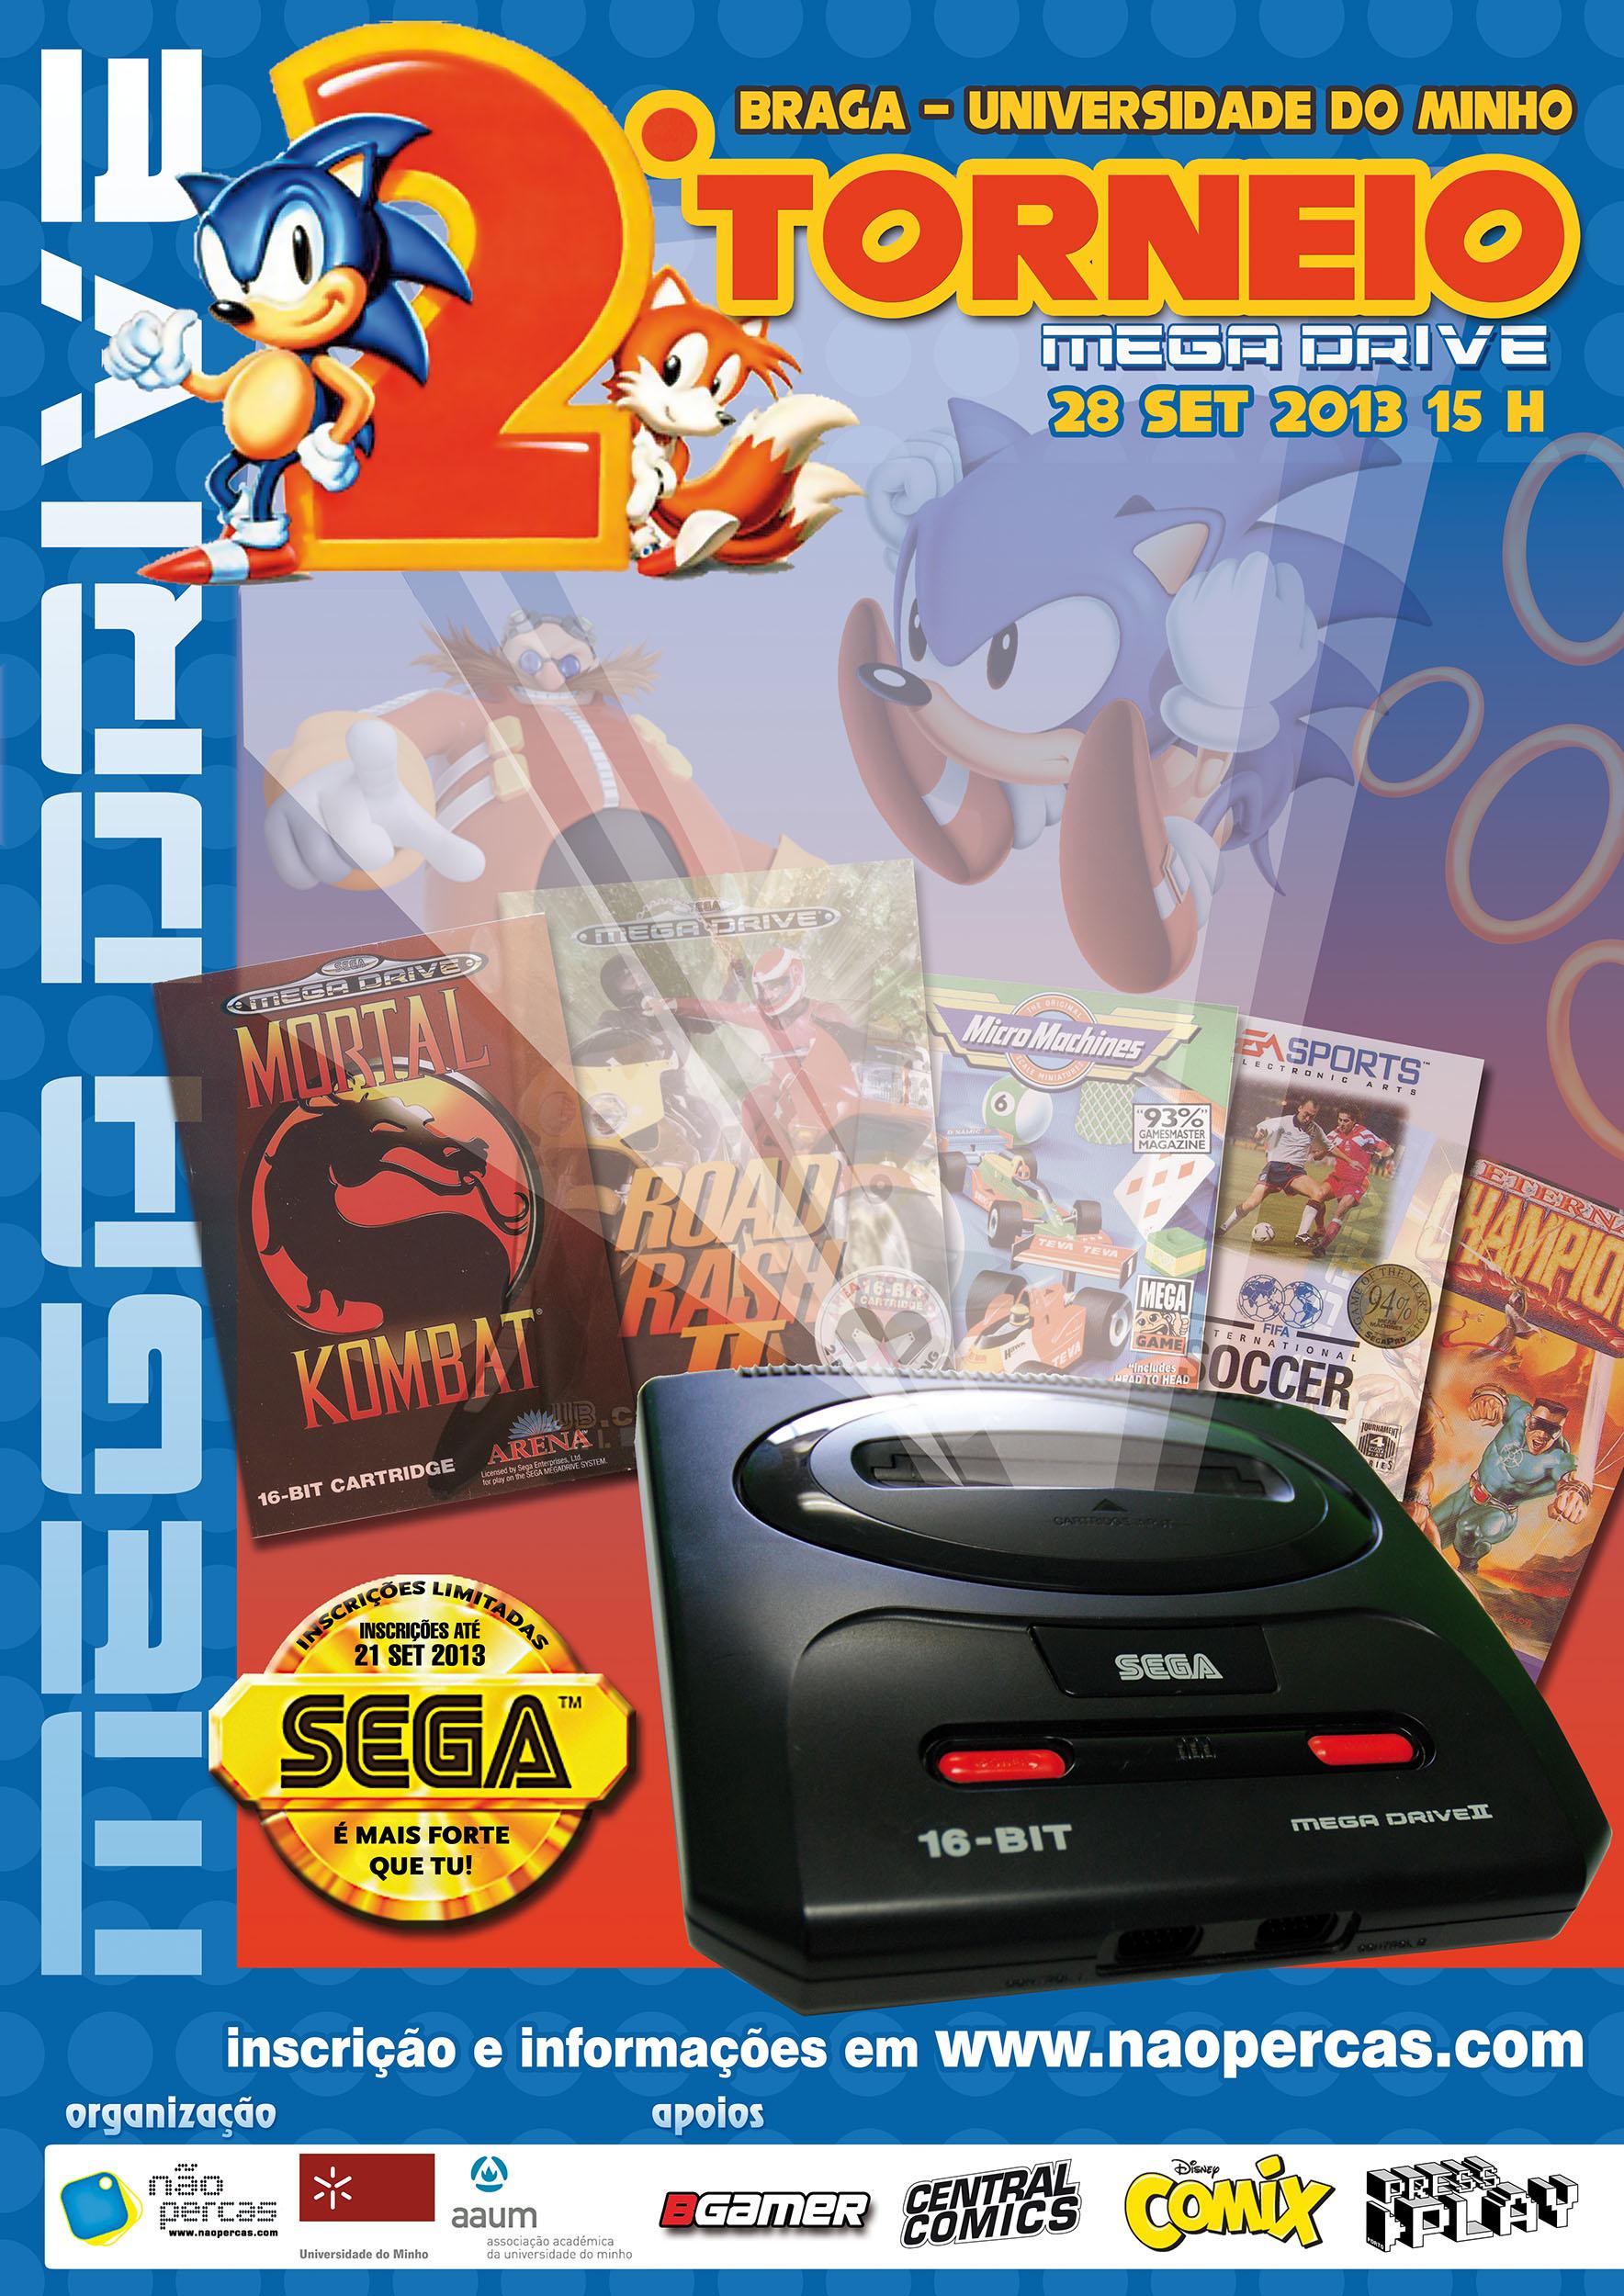 II Torneio Sega Mega Drive em Braga